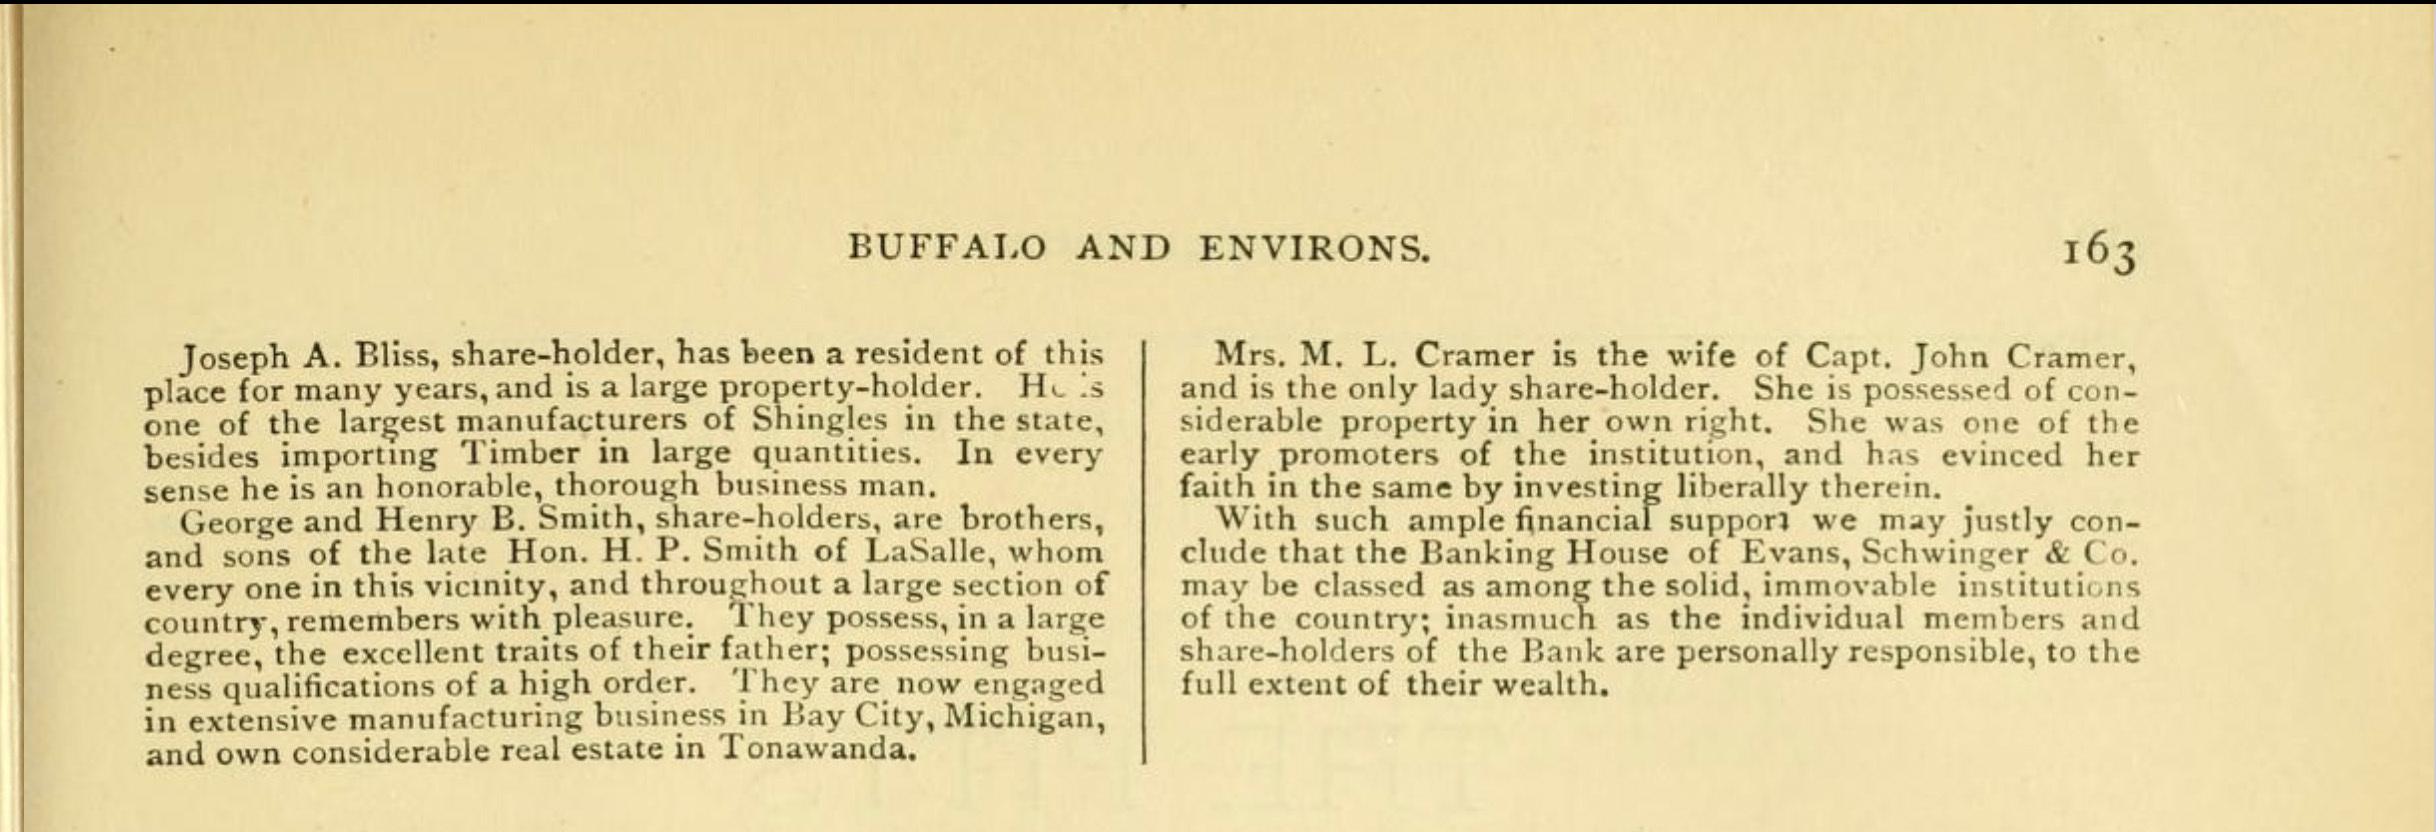 Tonawanda, book excerpt (Commerce, 1880) p163.jpg